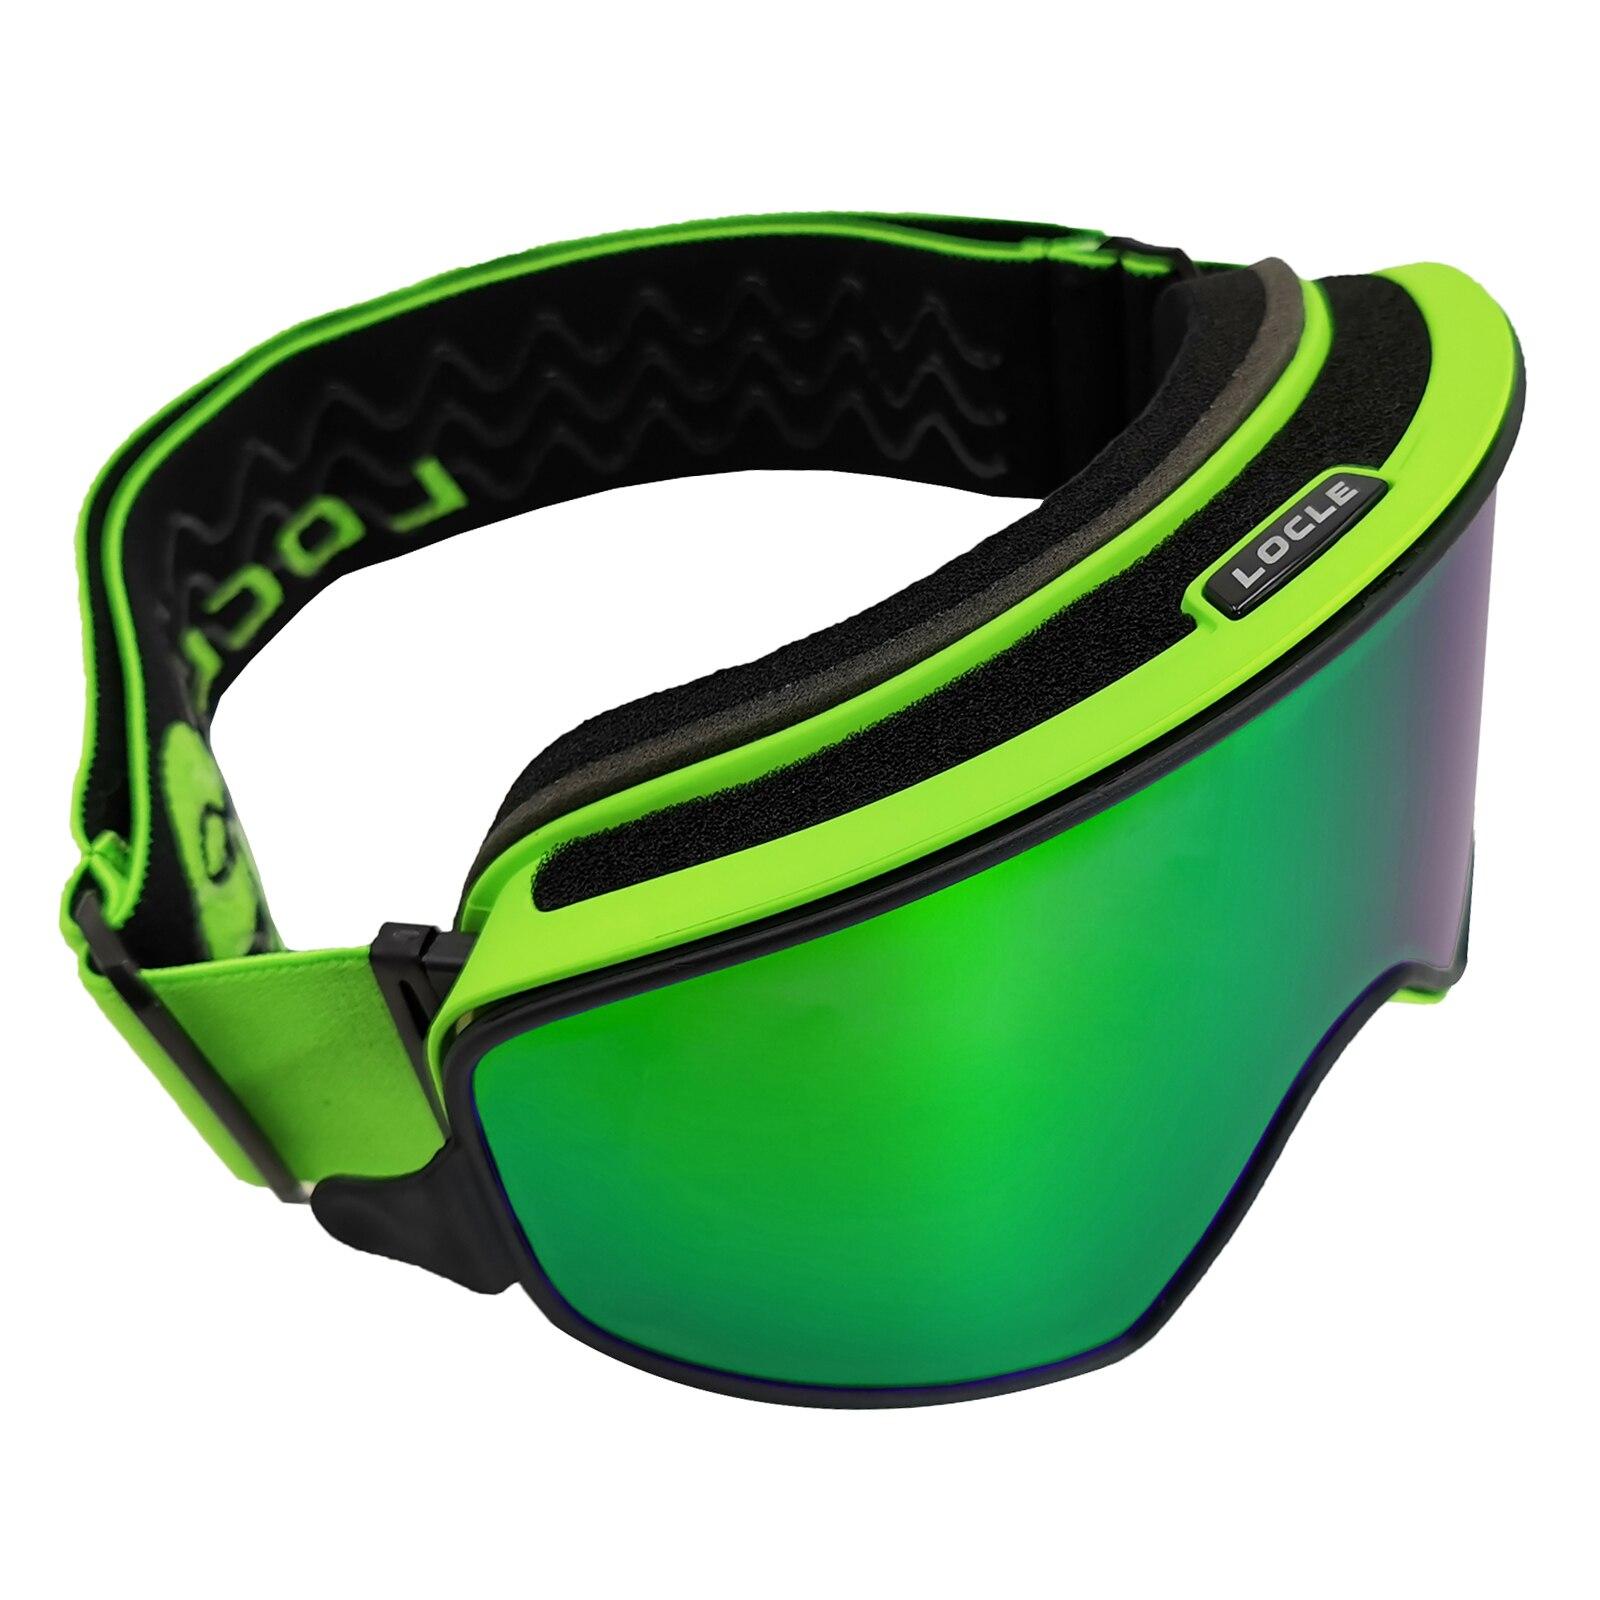 LOCLE Magnetic Quick-change Ski Goggles 2 In 1 Men Women Snowboard Goggles Skiing Glasses Snow Skiing Glasses Anti-fog Ski Mask